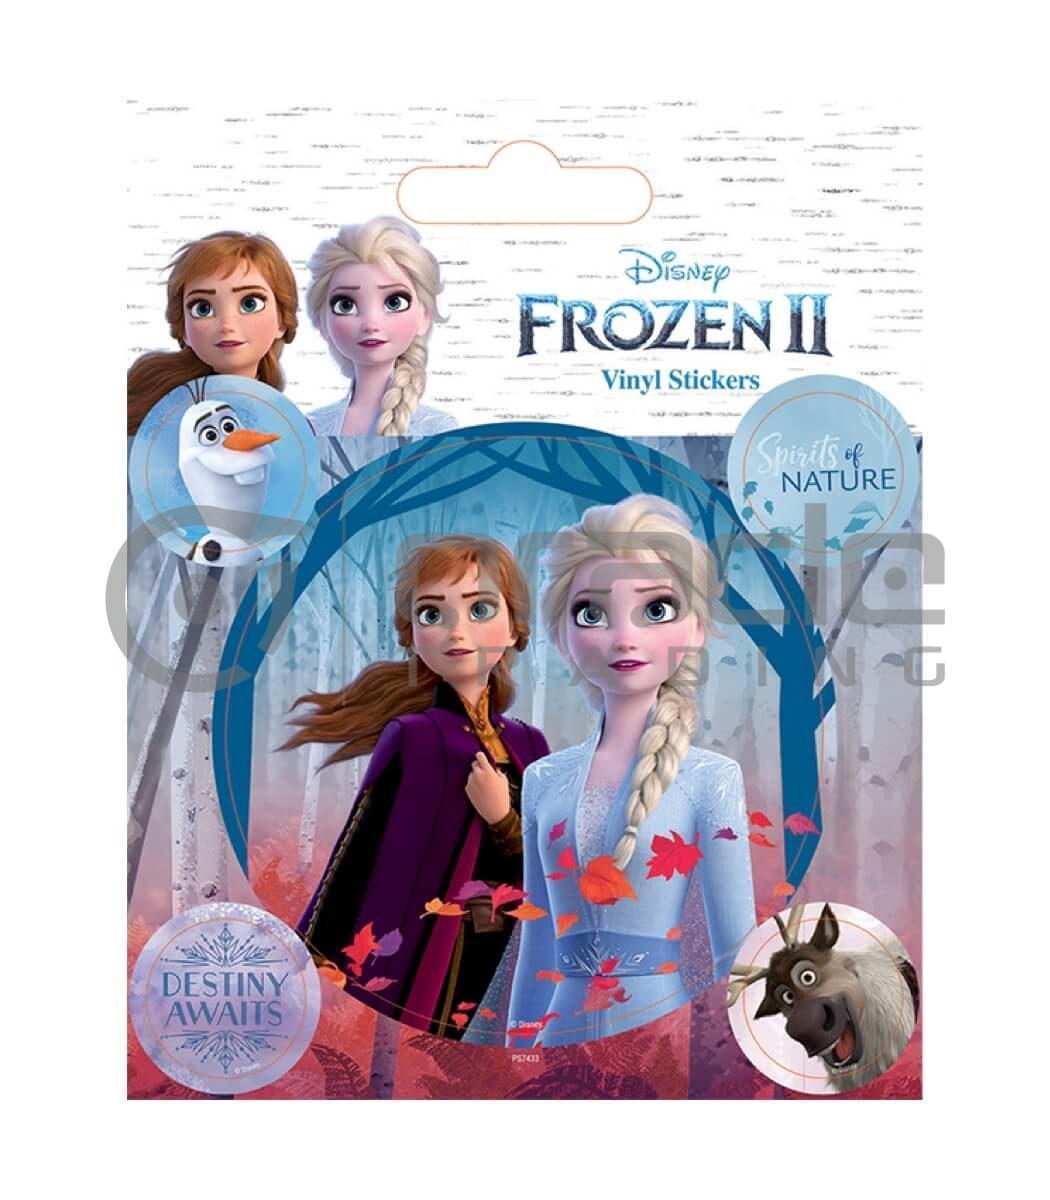 Frozen Vinyl Sticker Pack